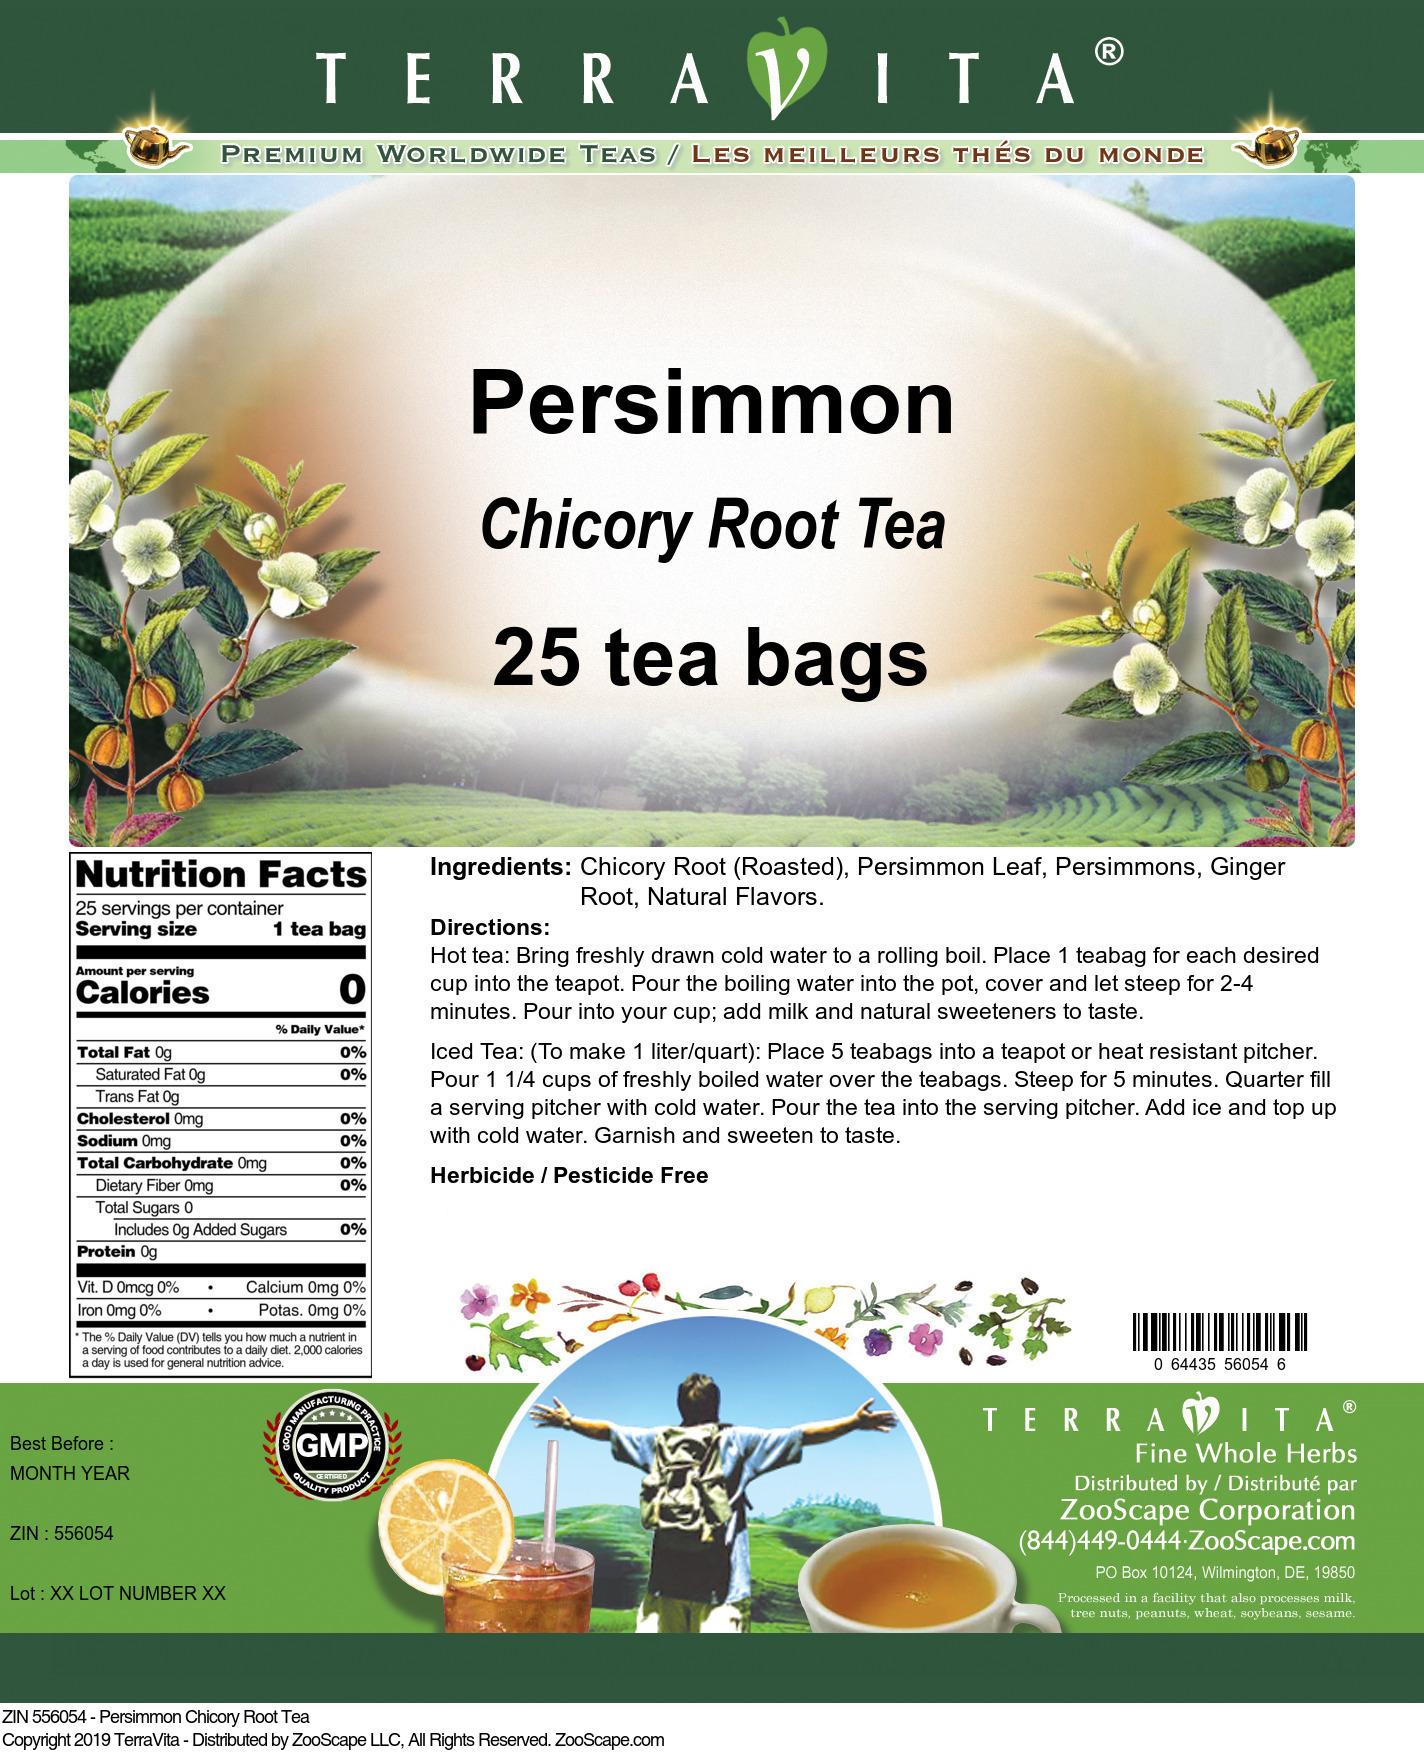 Persimmon Chicory Root